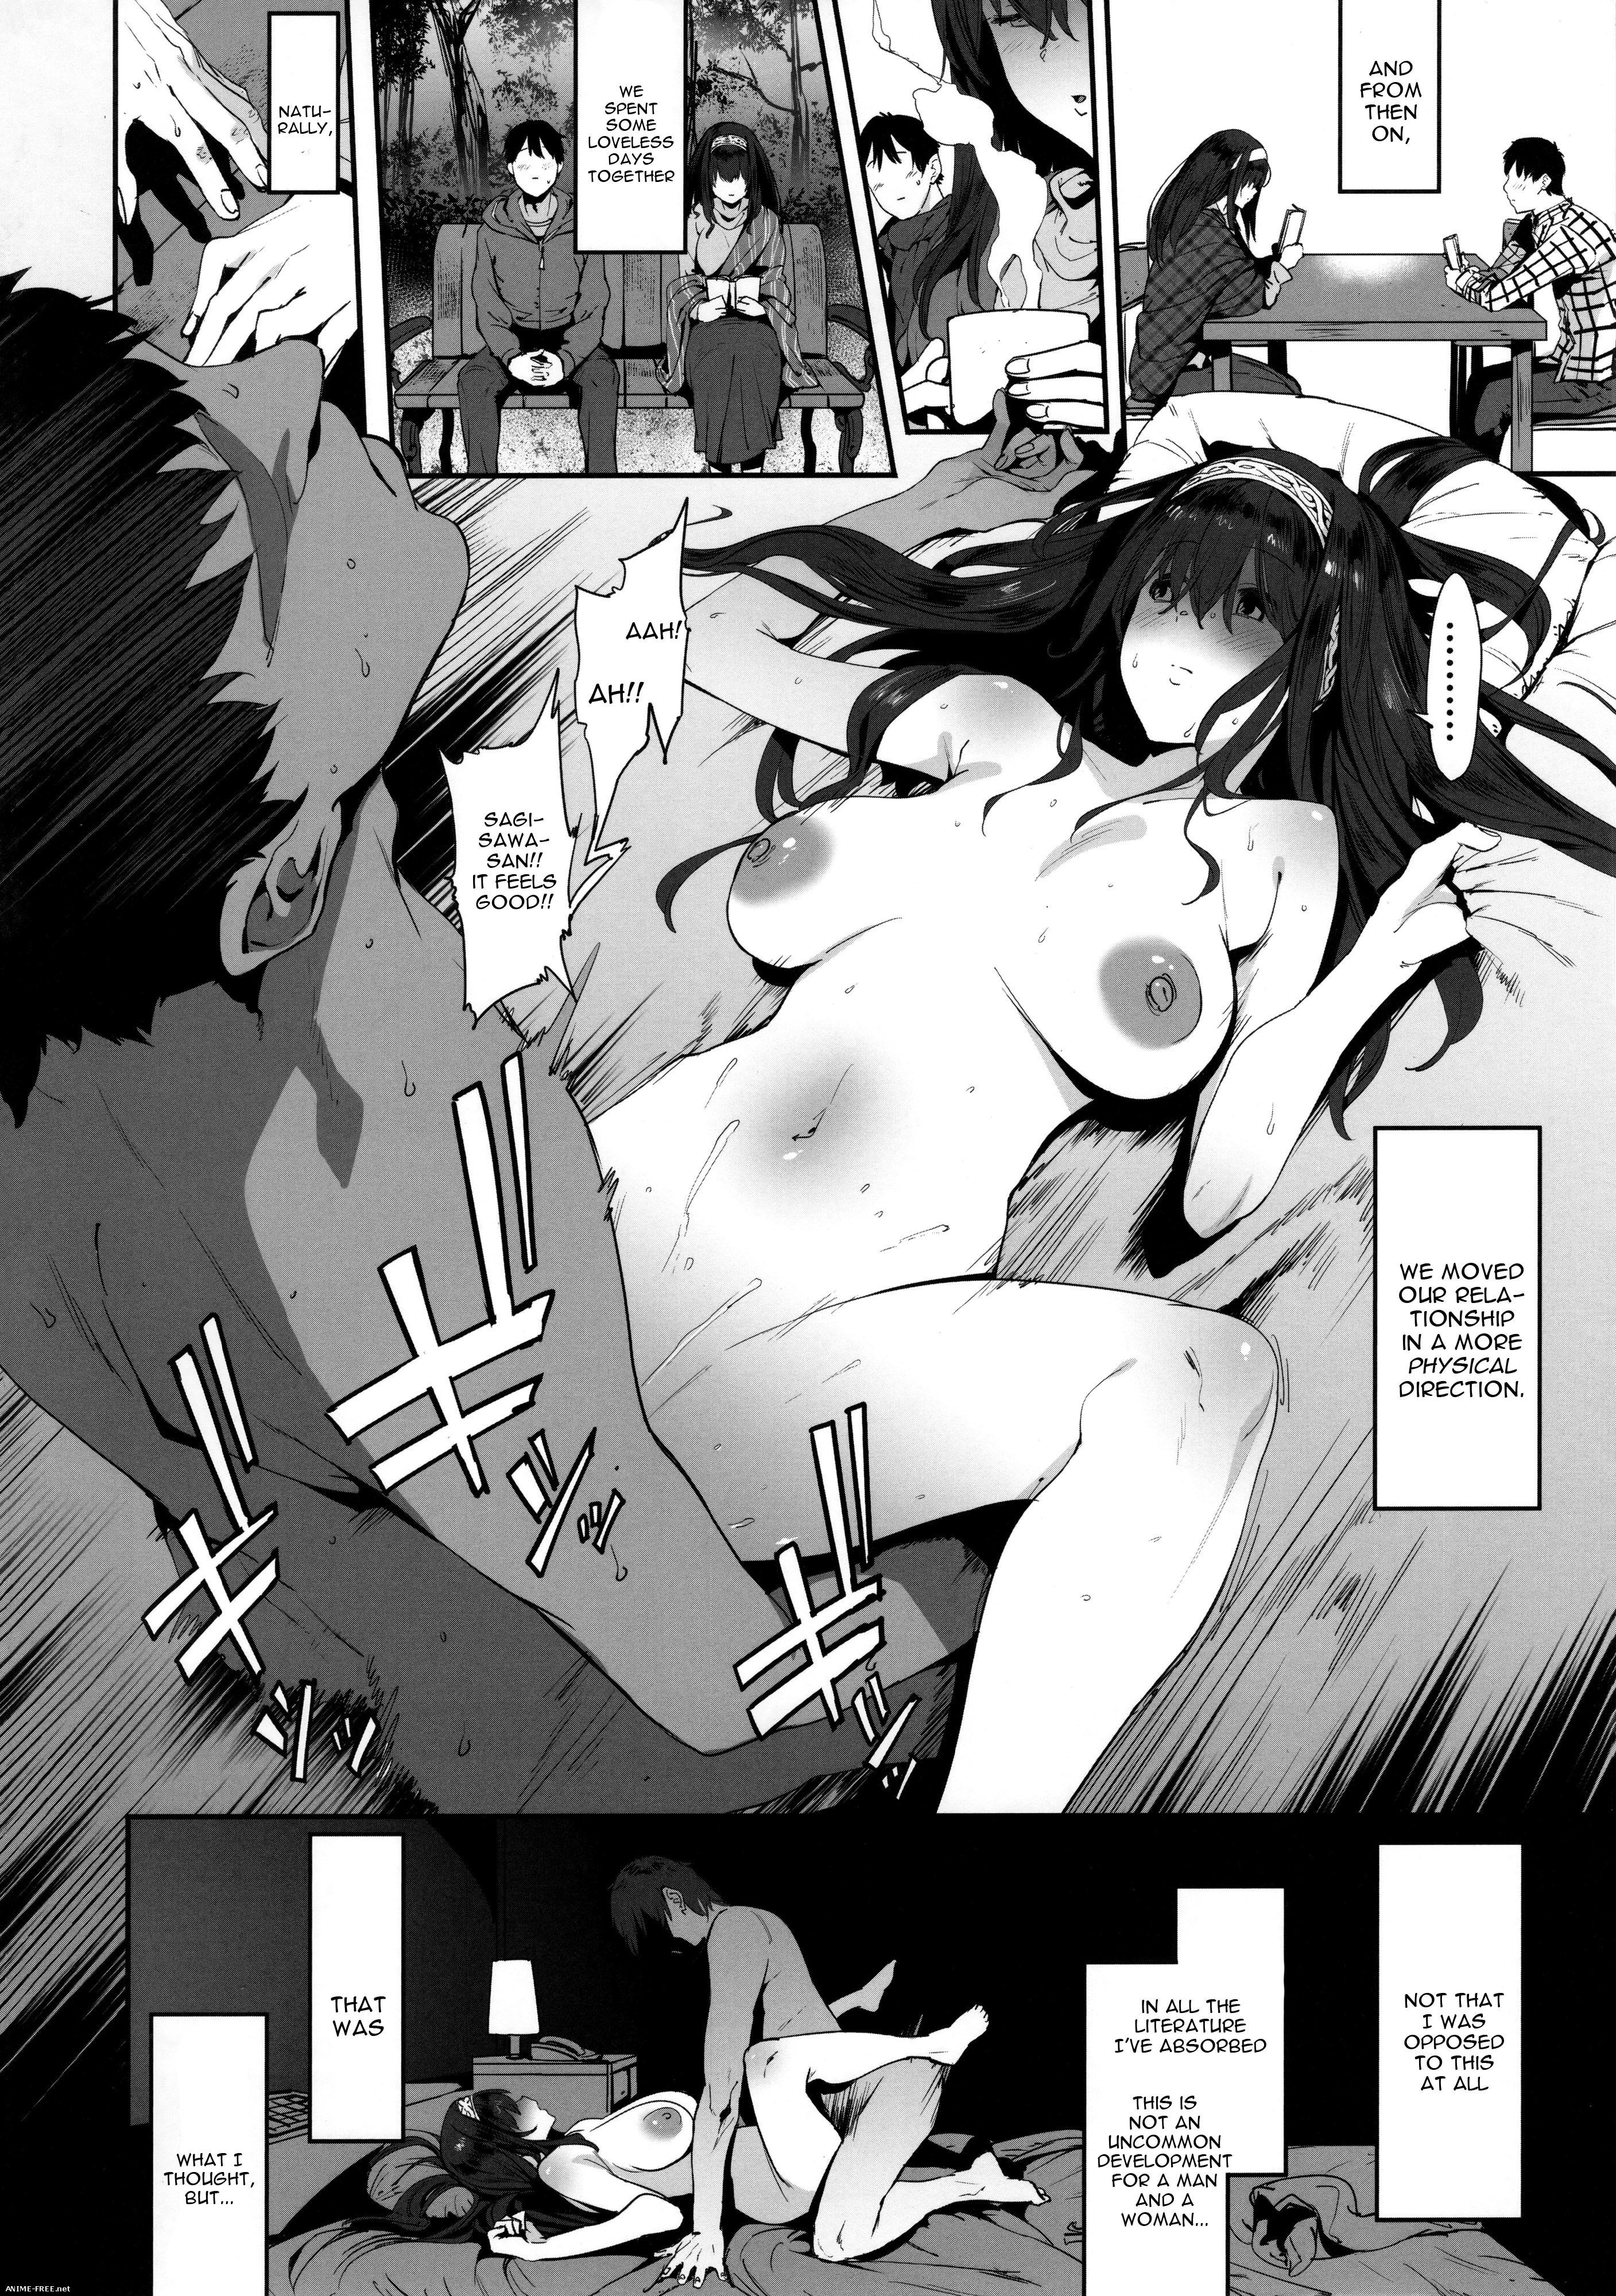 Pija / Pijya (Pianiishimo) - Сборник хентай манги [Cen] [JAP,RUS,ENG] Manga Hentai